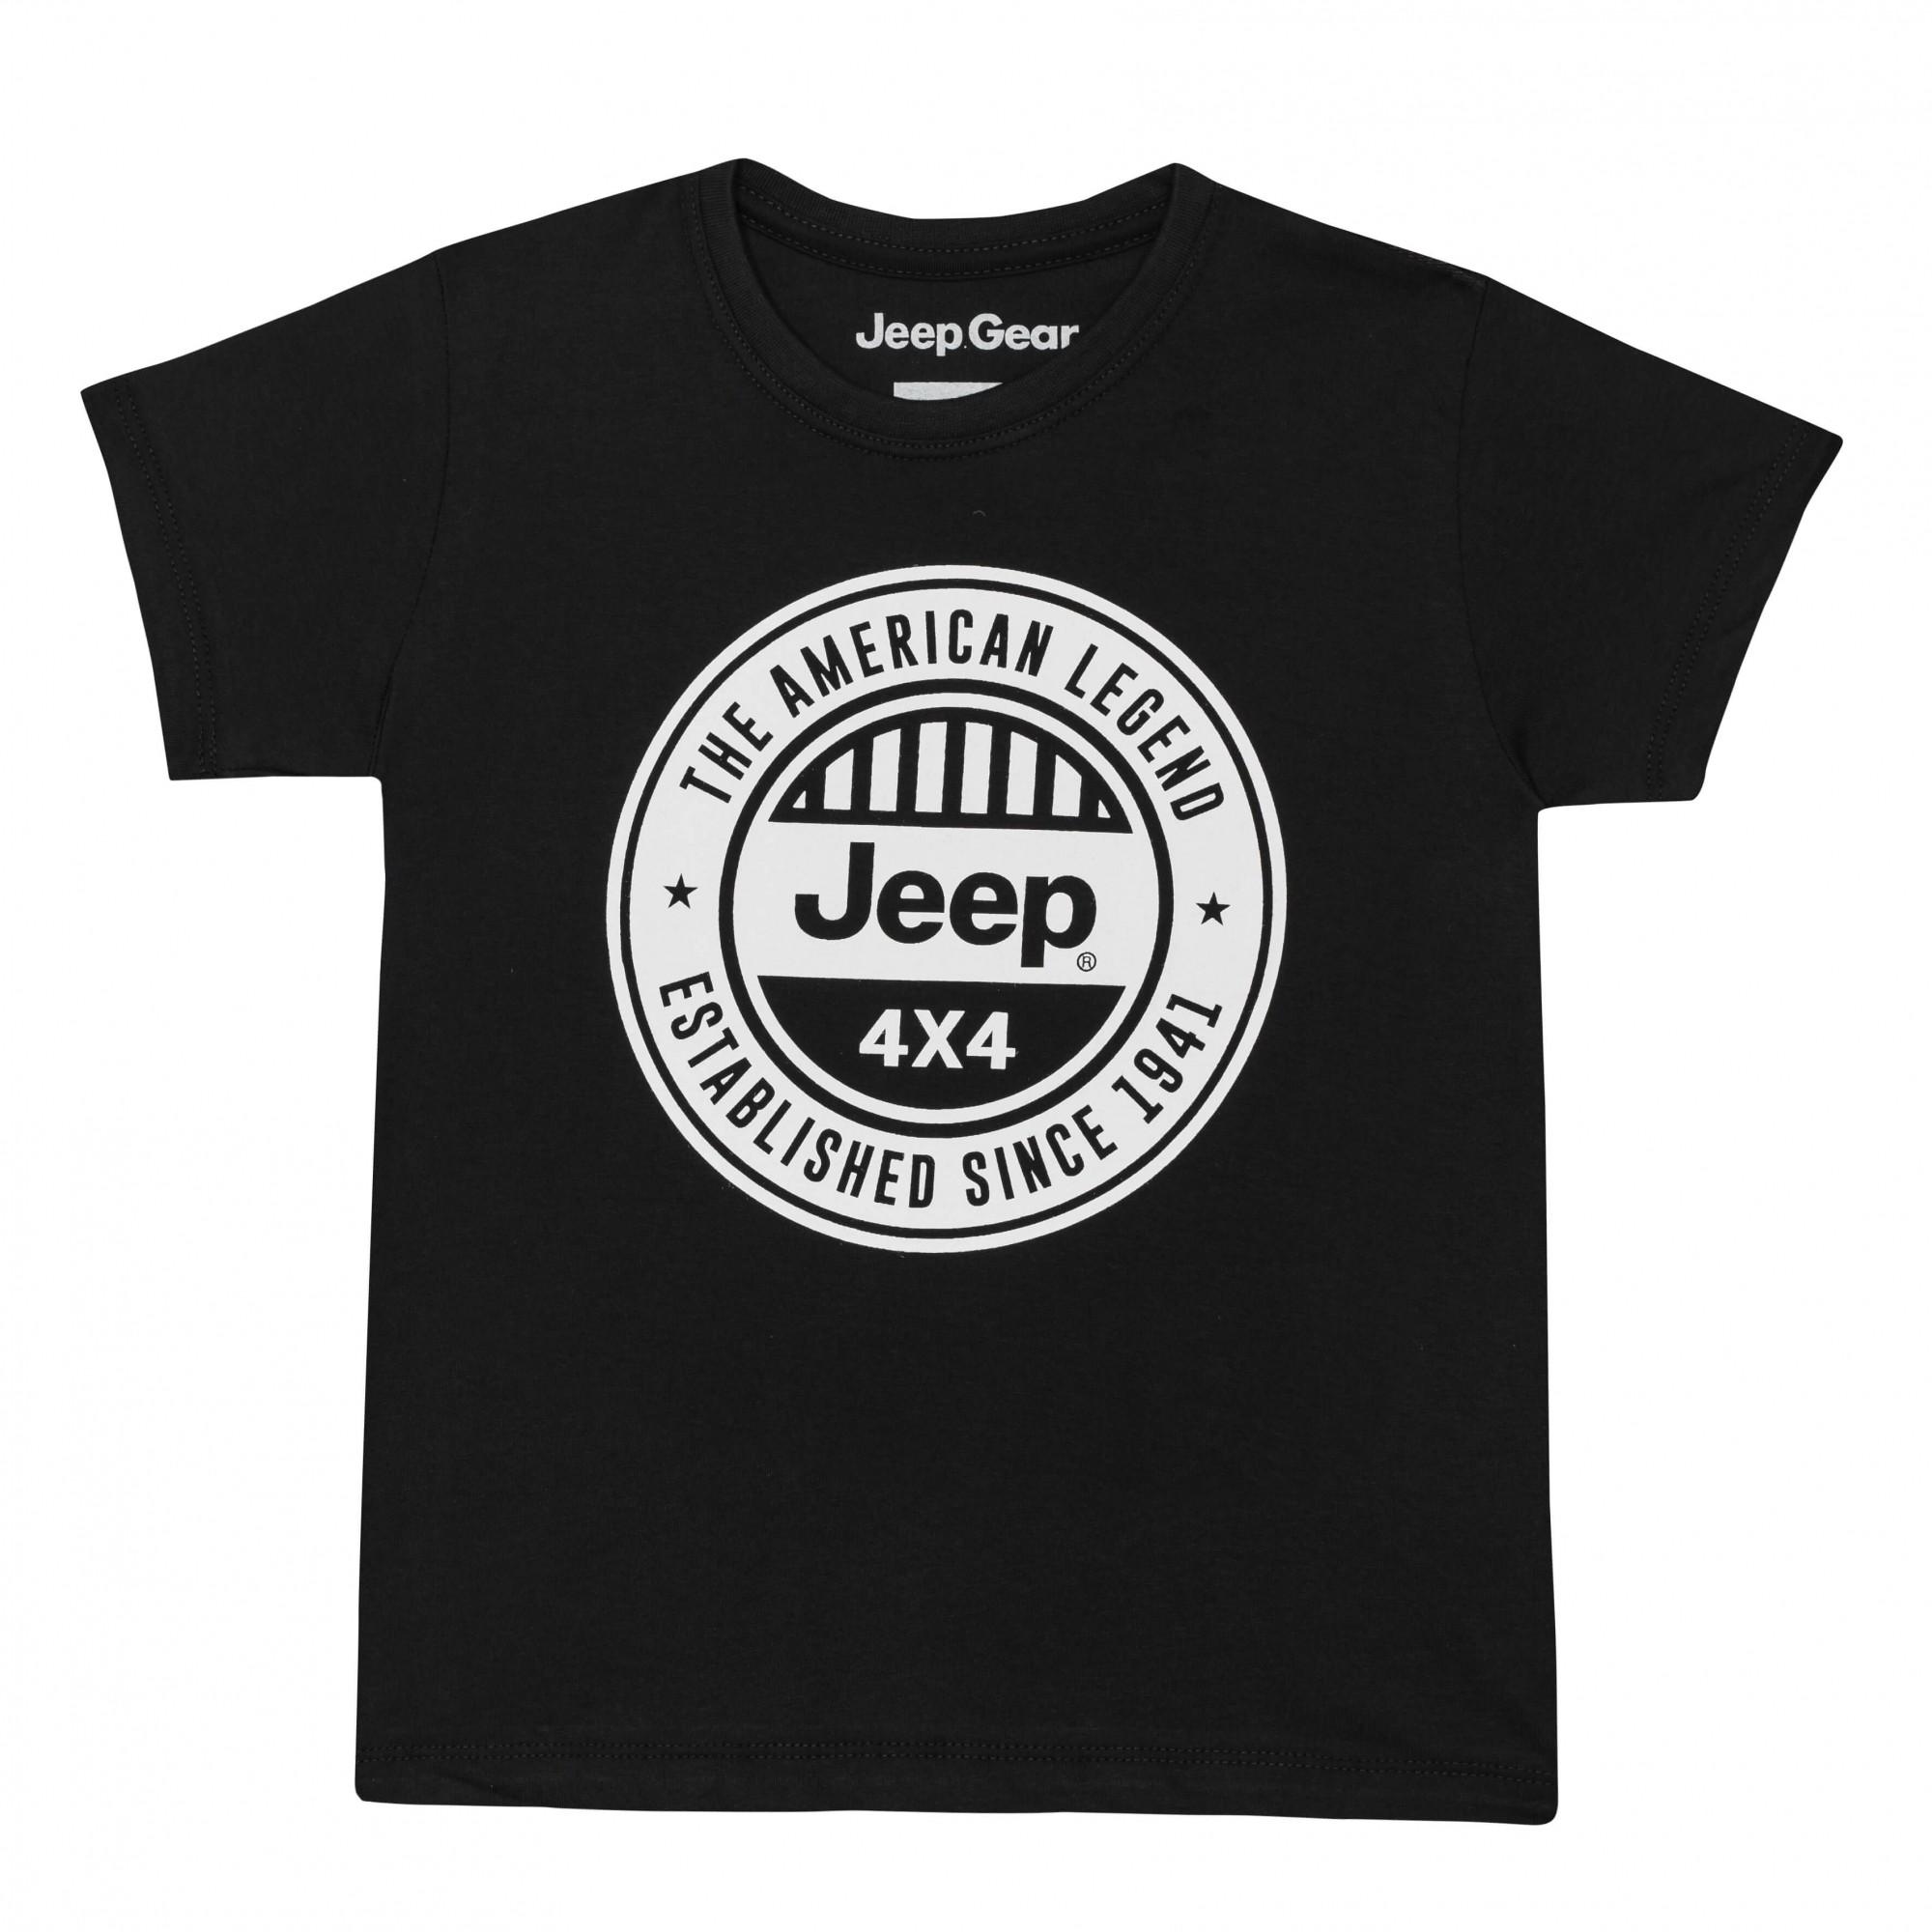 Camiseta Inf. Jeep American Legend 4x4 - Preta